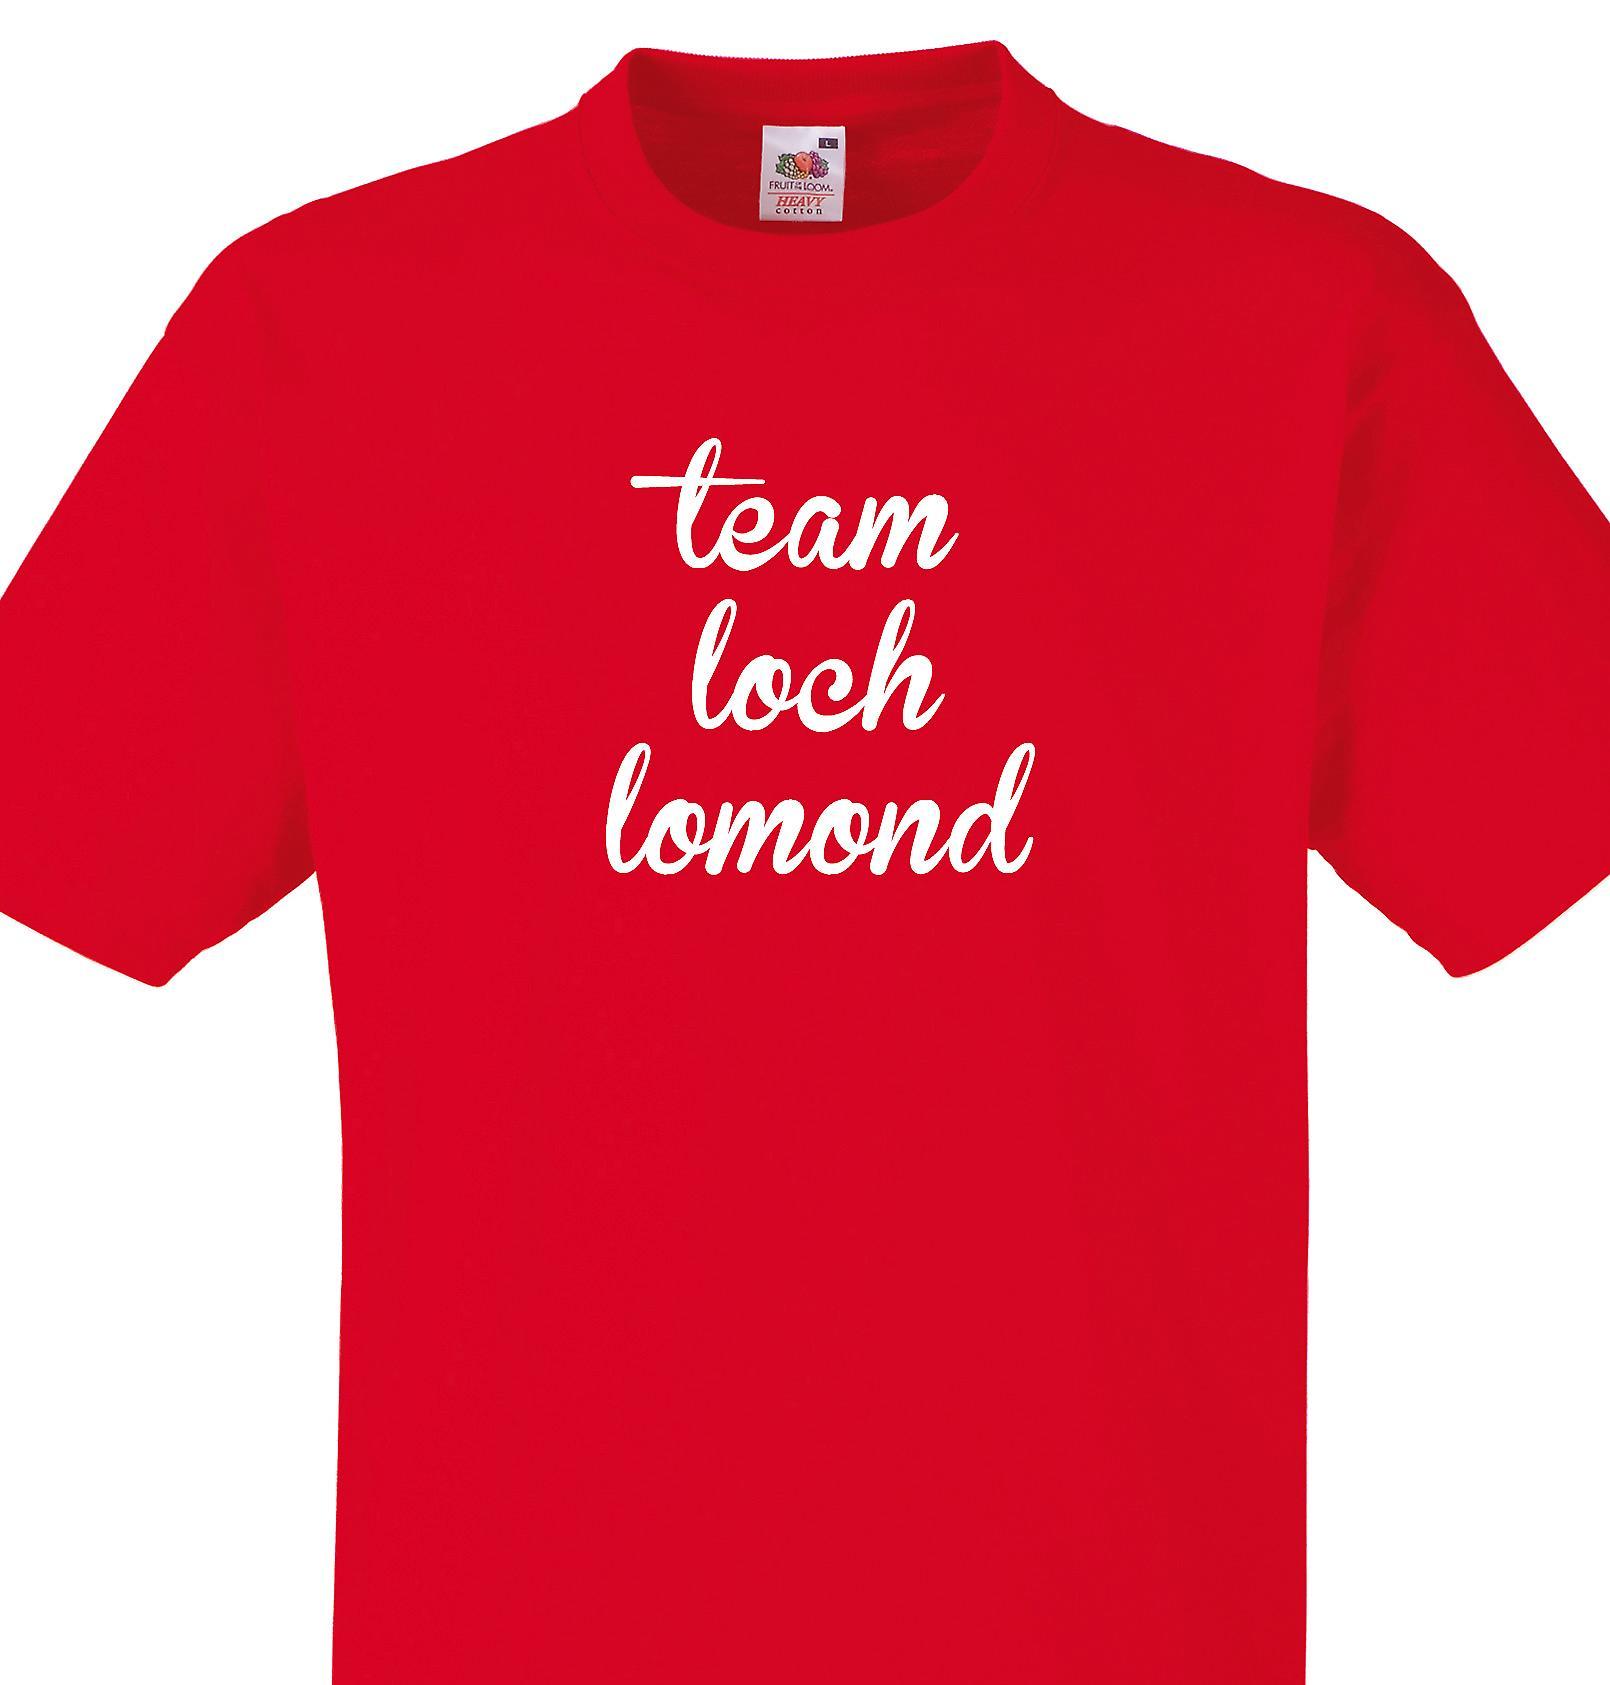 Team Loch lomond Red T shirt